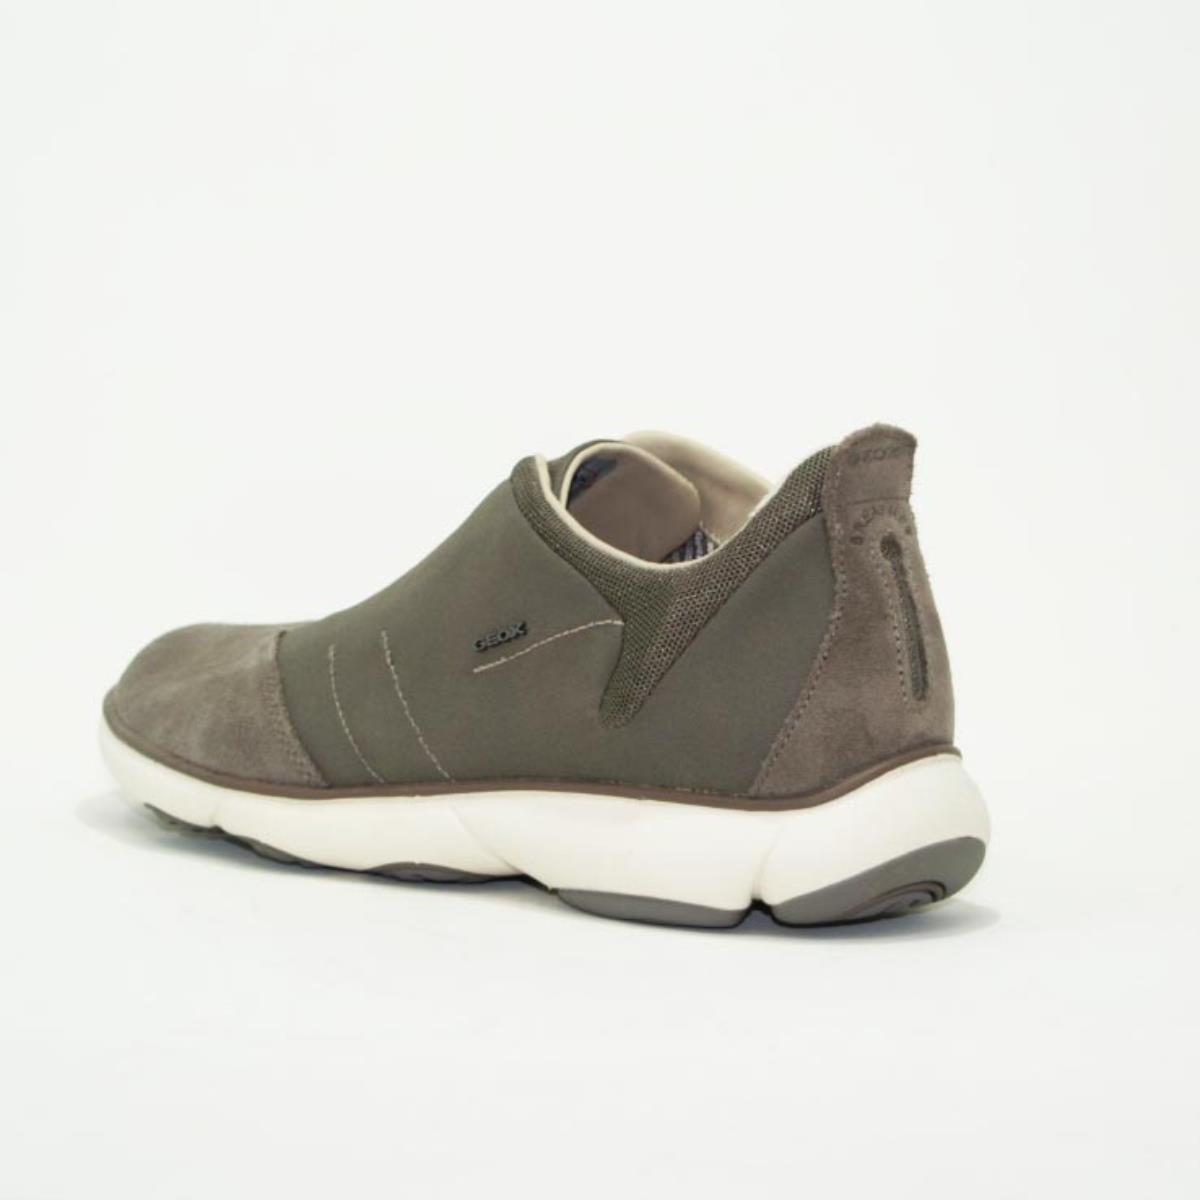 geox sneakers bassa nebula sportiva uomo lacci elastici camoscio grigio U52D7B